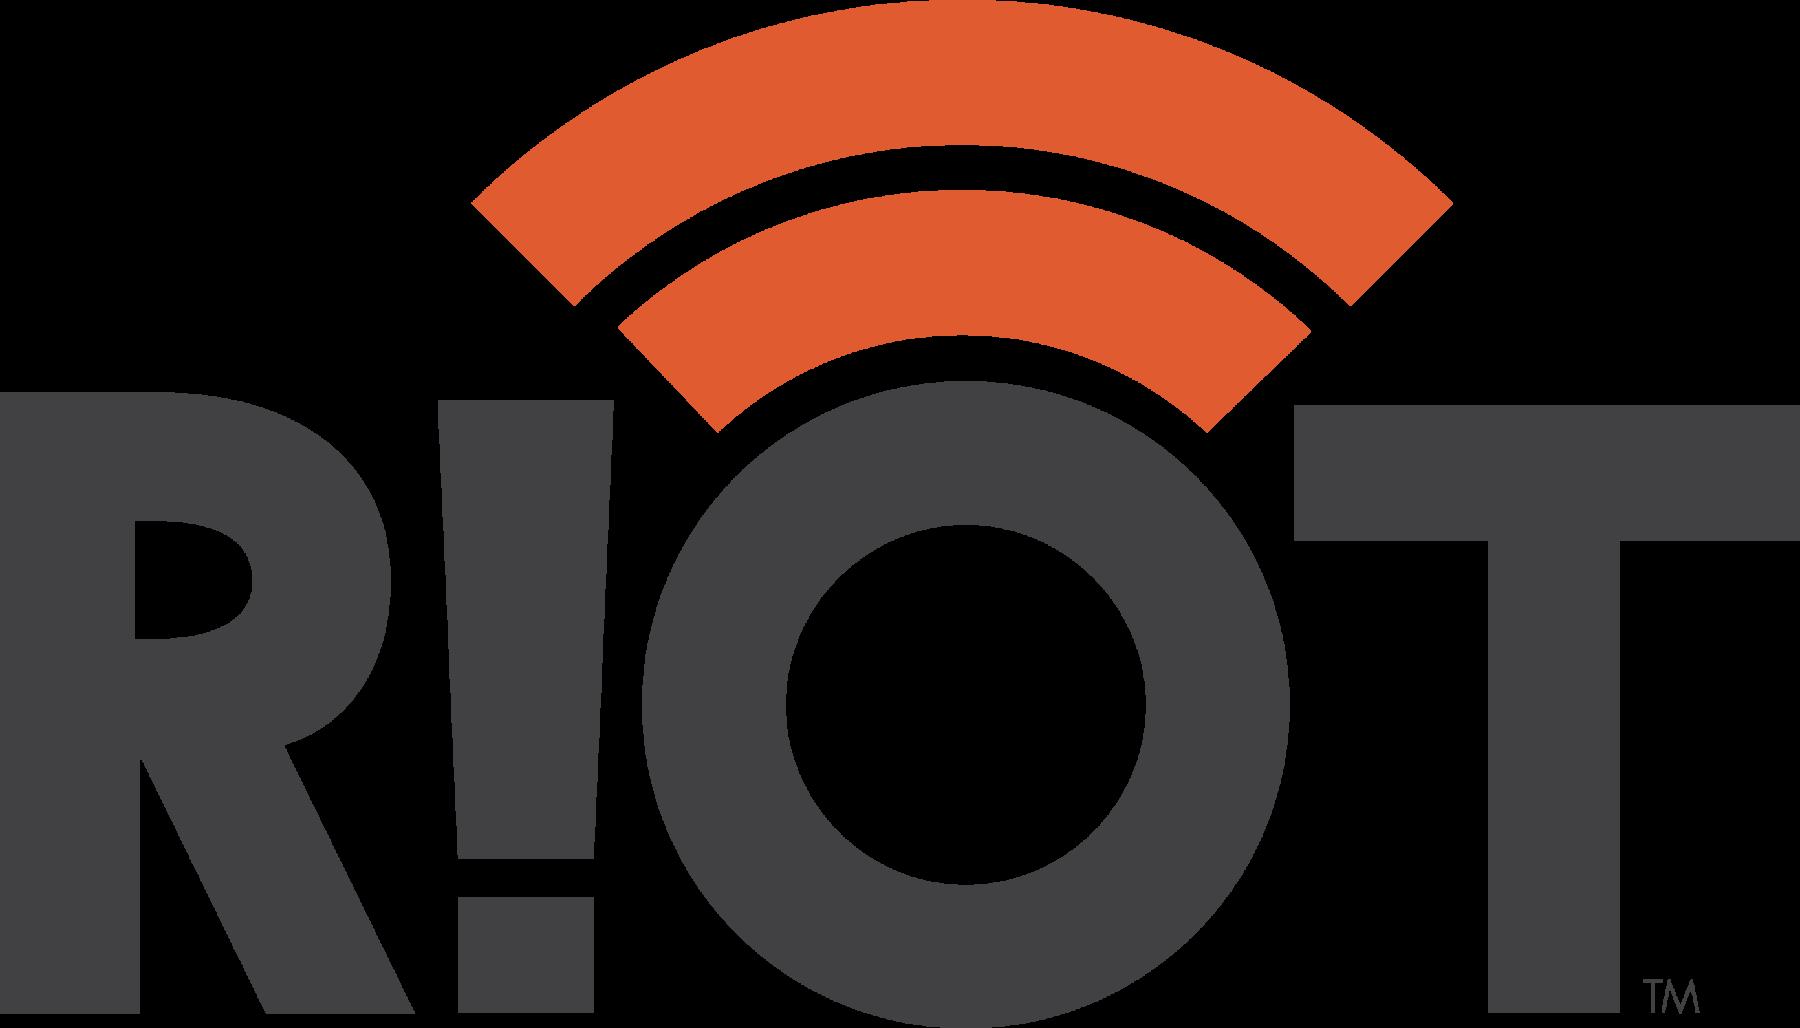 USERiot_logo